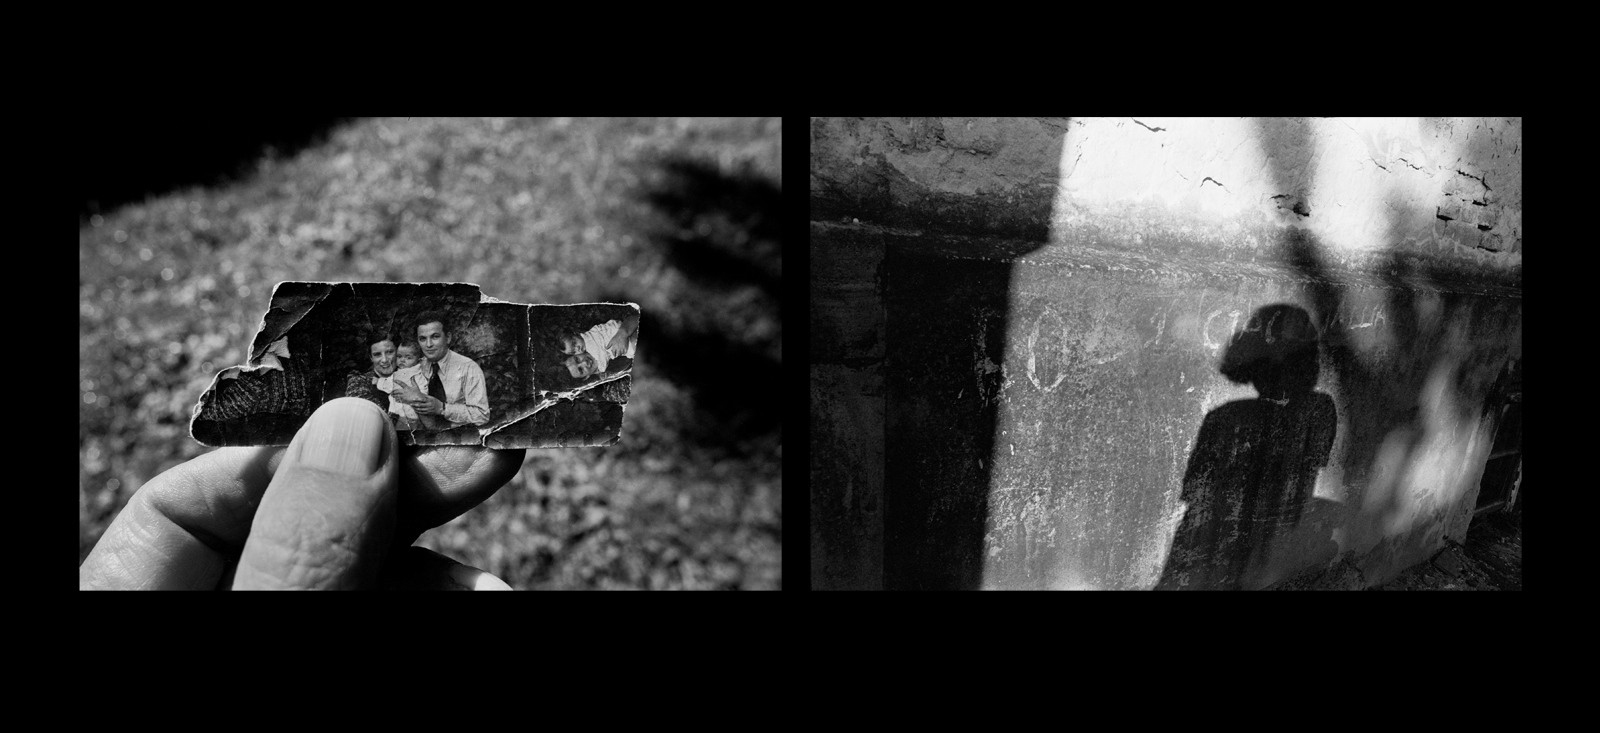 Art and Documentary Photography - Loading 9_Fragments_sdeswaan.jpg